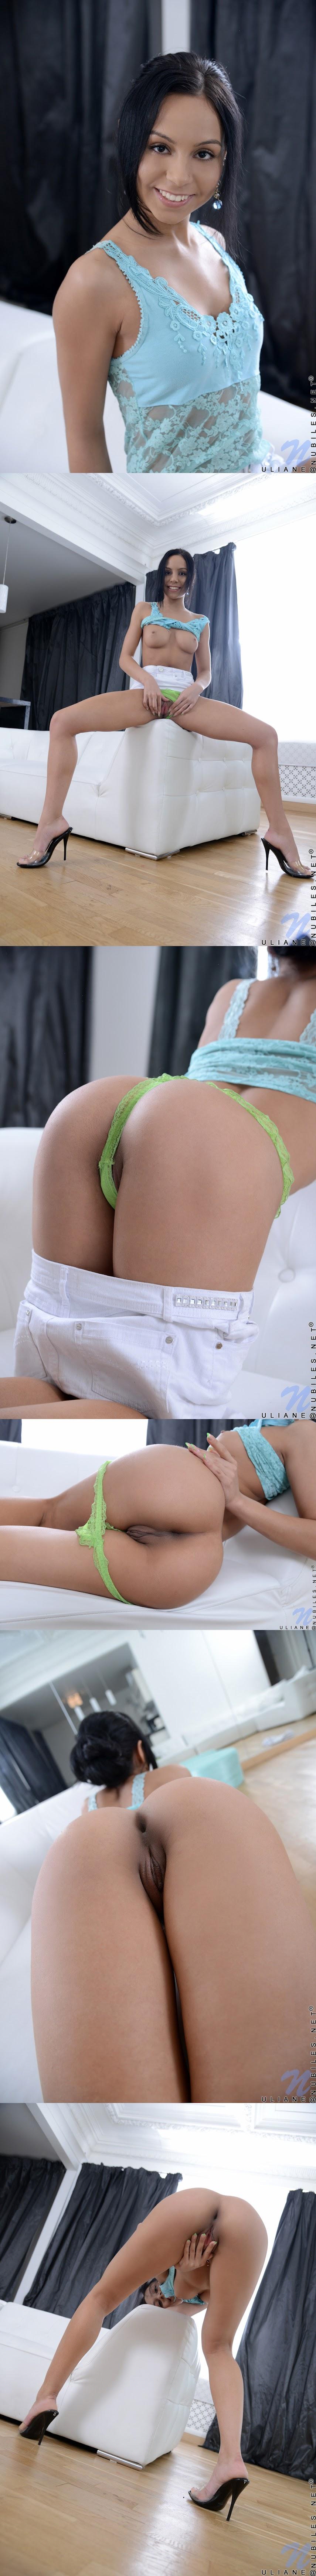 Nubiles.net  2013-11-04 Jessi Green Tight Slim Body